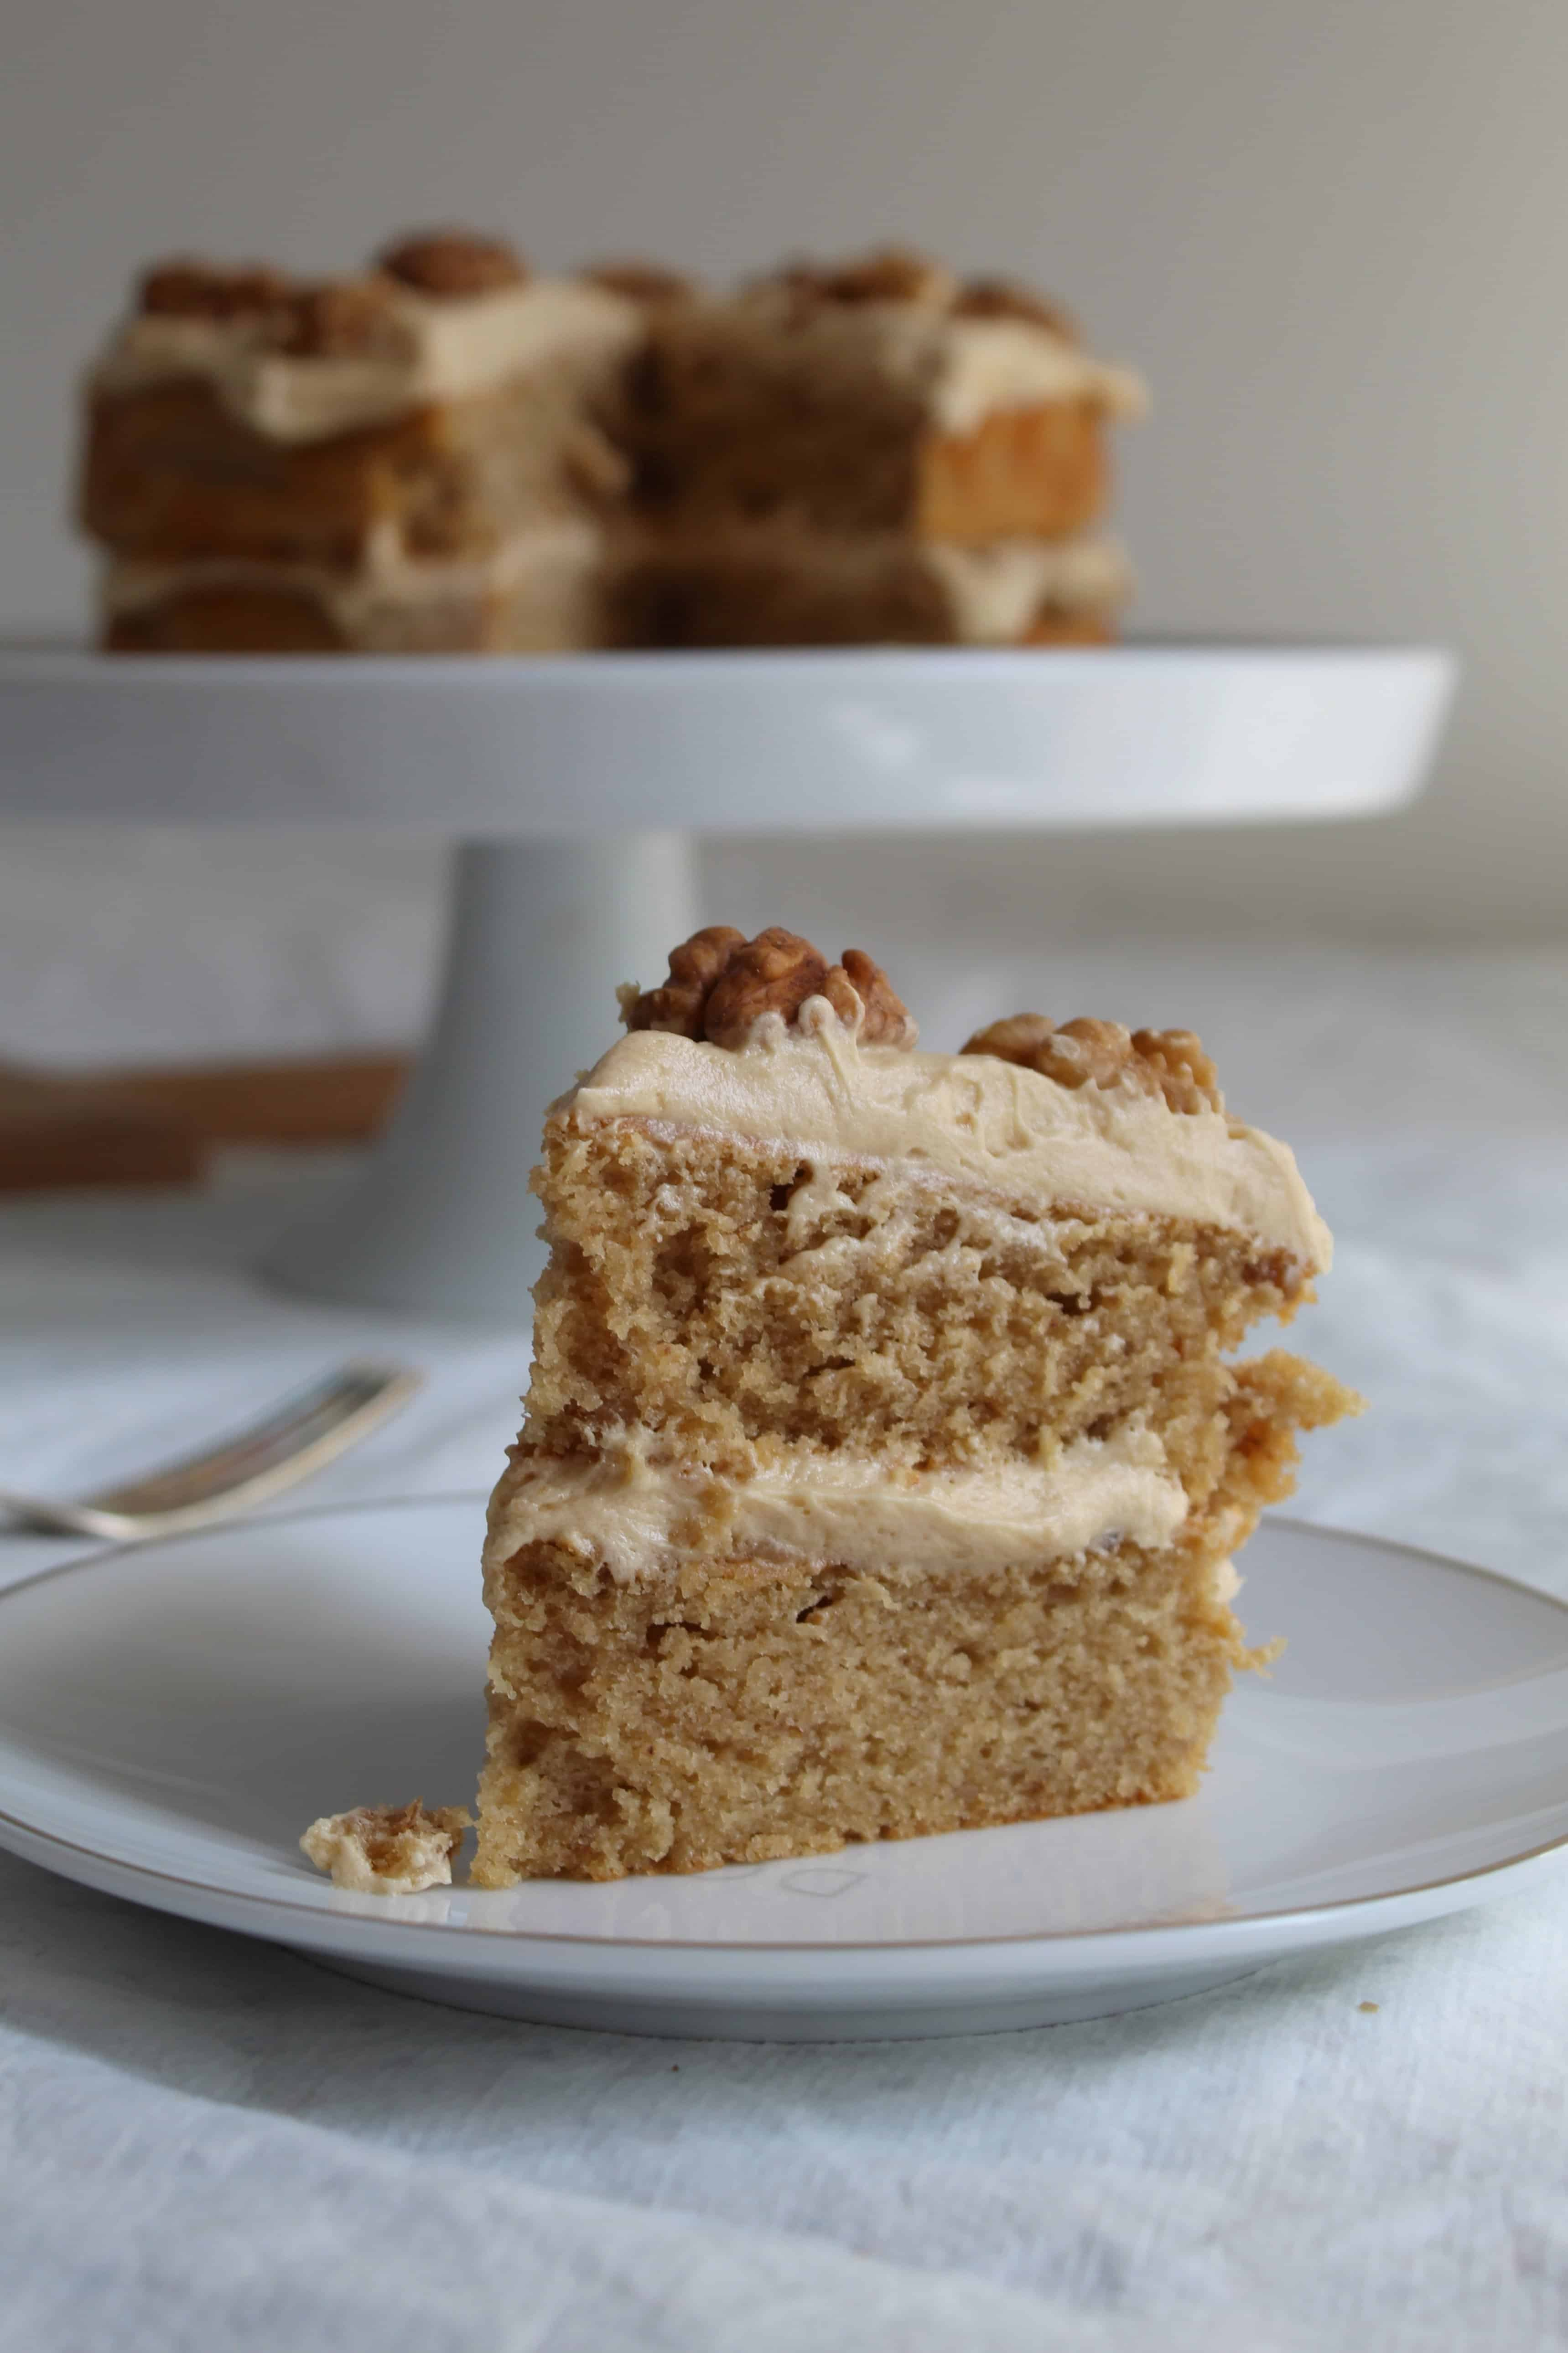 GLUTEN FREE COFFEE AND WALNUT CAKE RECIPE WITH BUTTERMILK 49